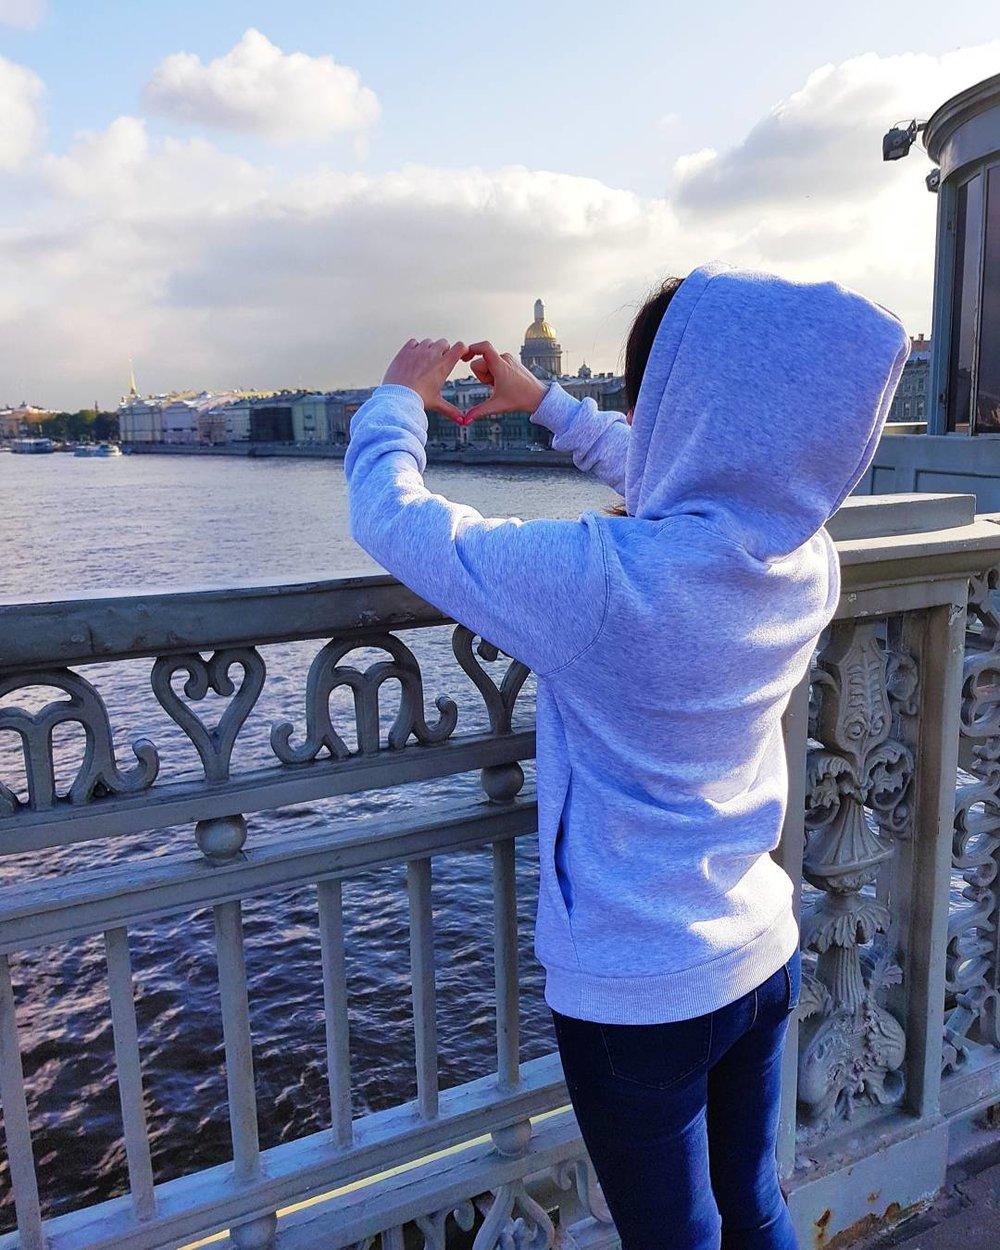 Looking over the Neva River in Saint Petersburg, Russia